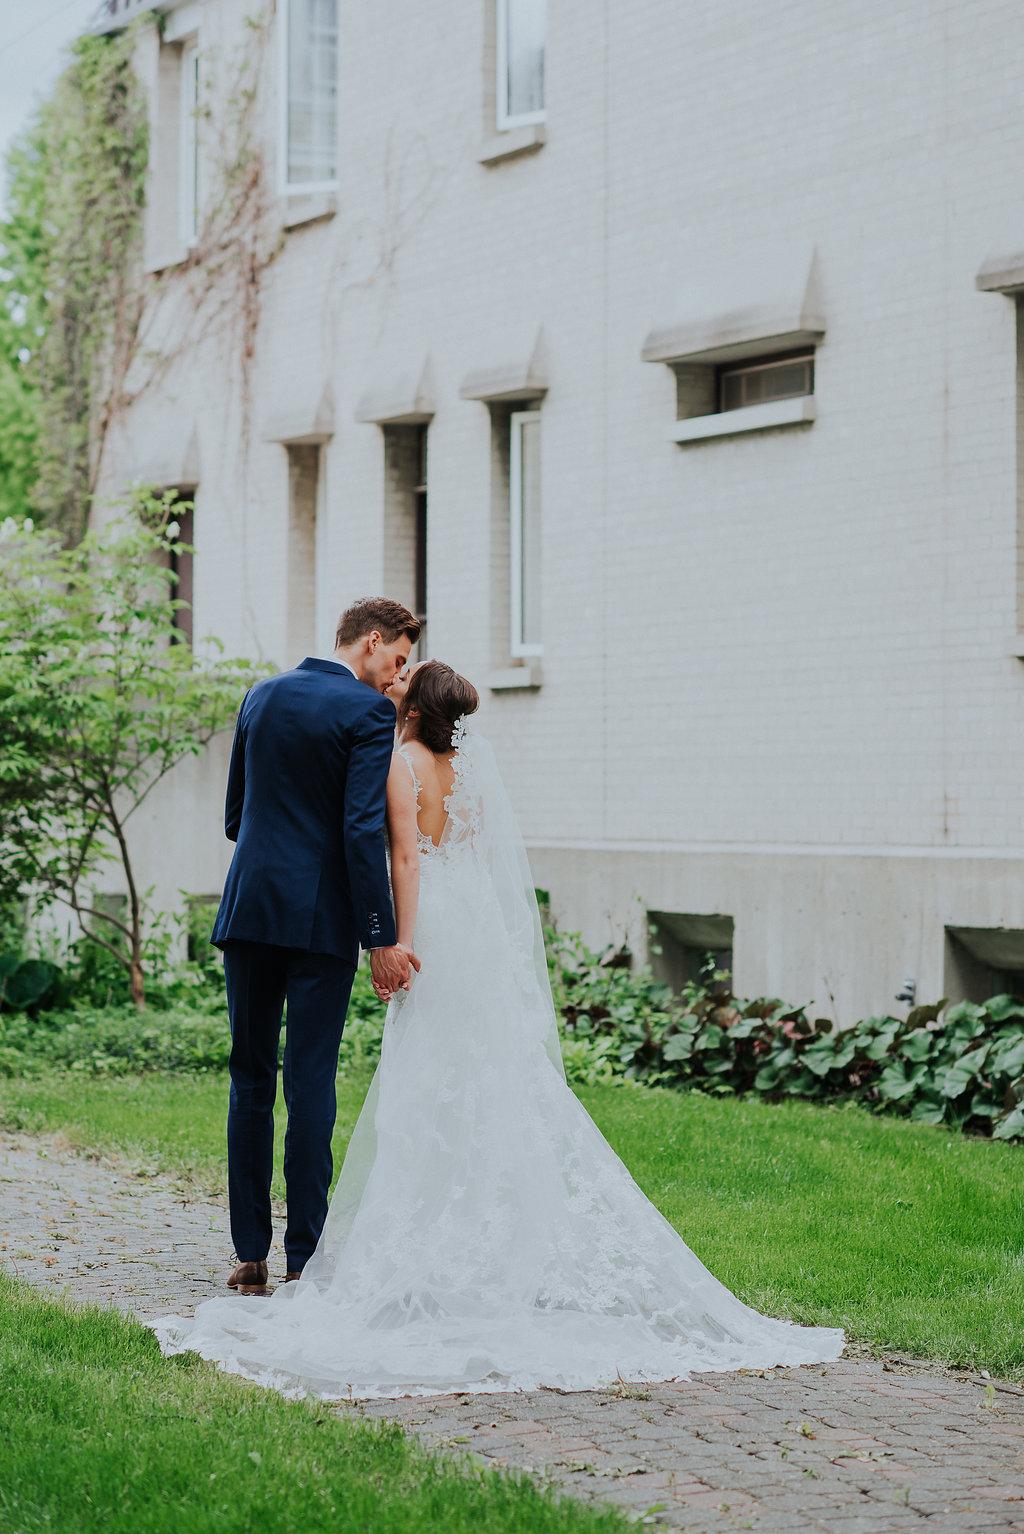 Winnipeg Wedding Photos - Wedding Florists in Winnipeg